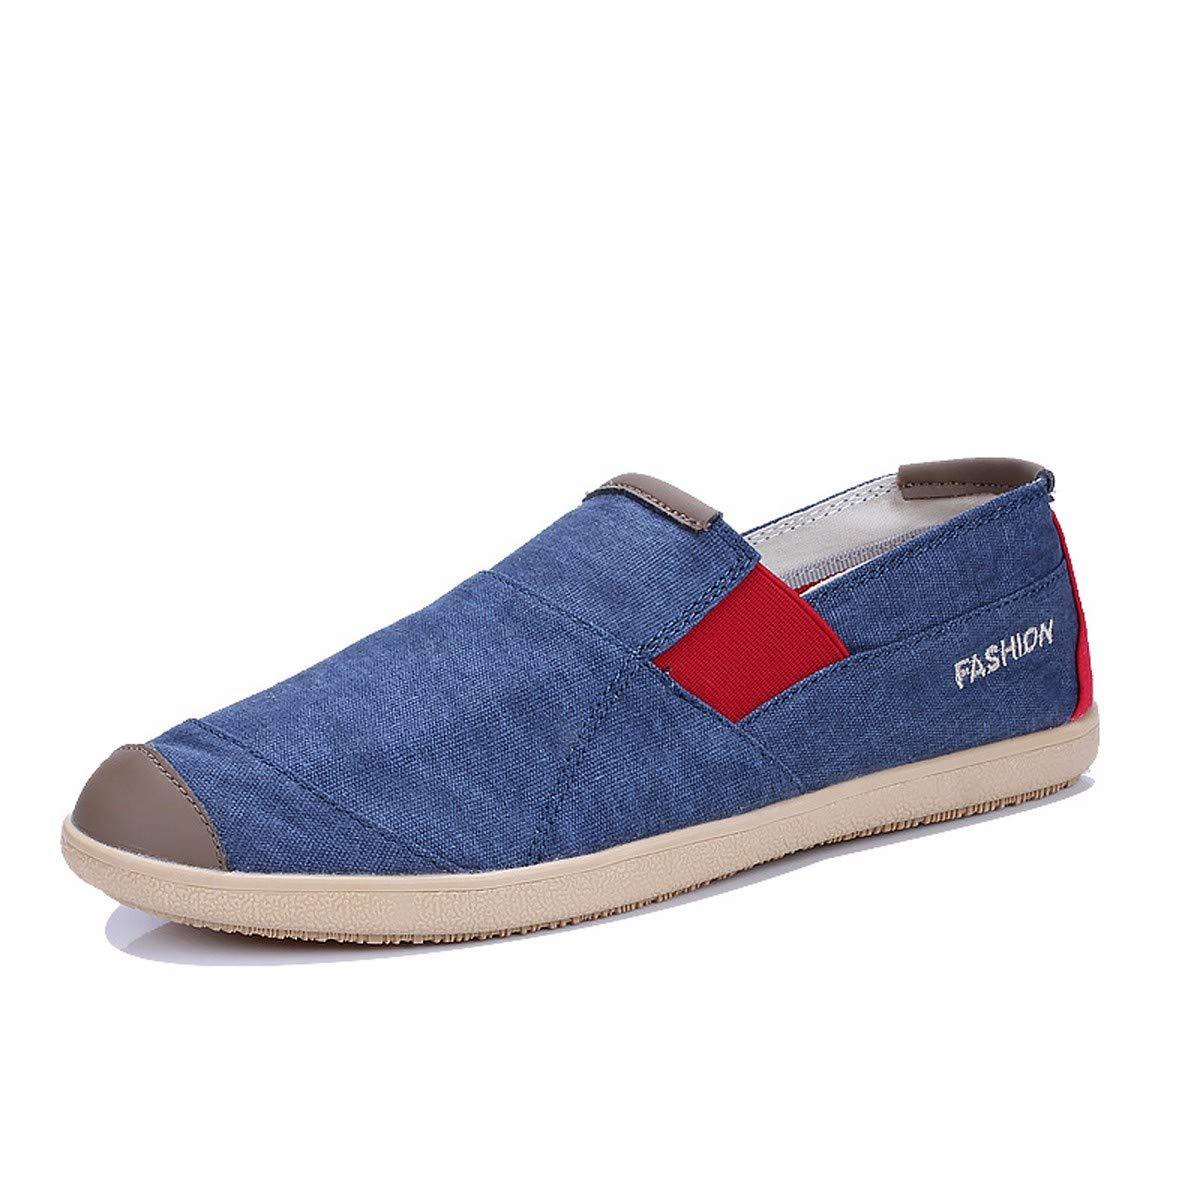 KMJBS Scarpe di tela Uomo autunno classico retro piedi pigro scarpe.Caffè Trentanove